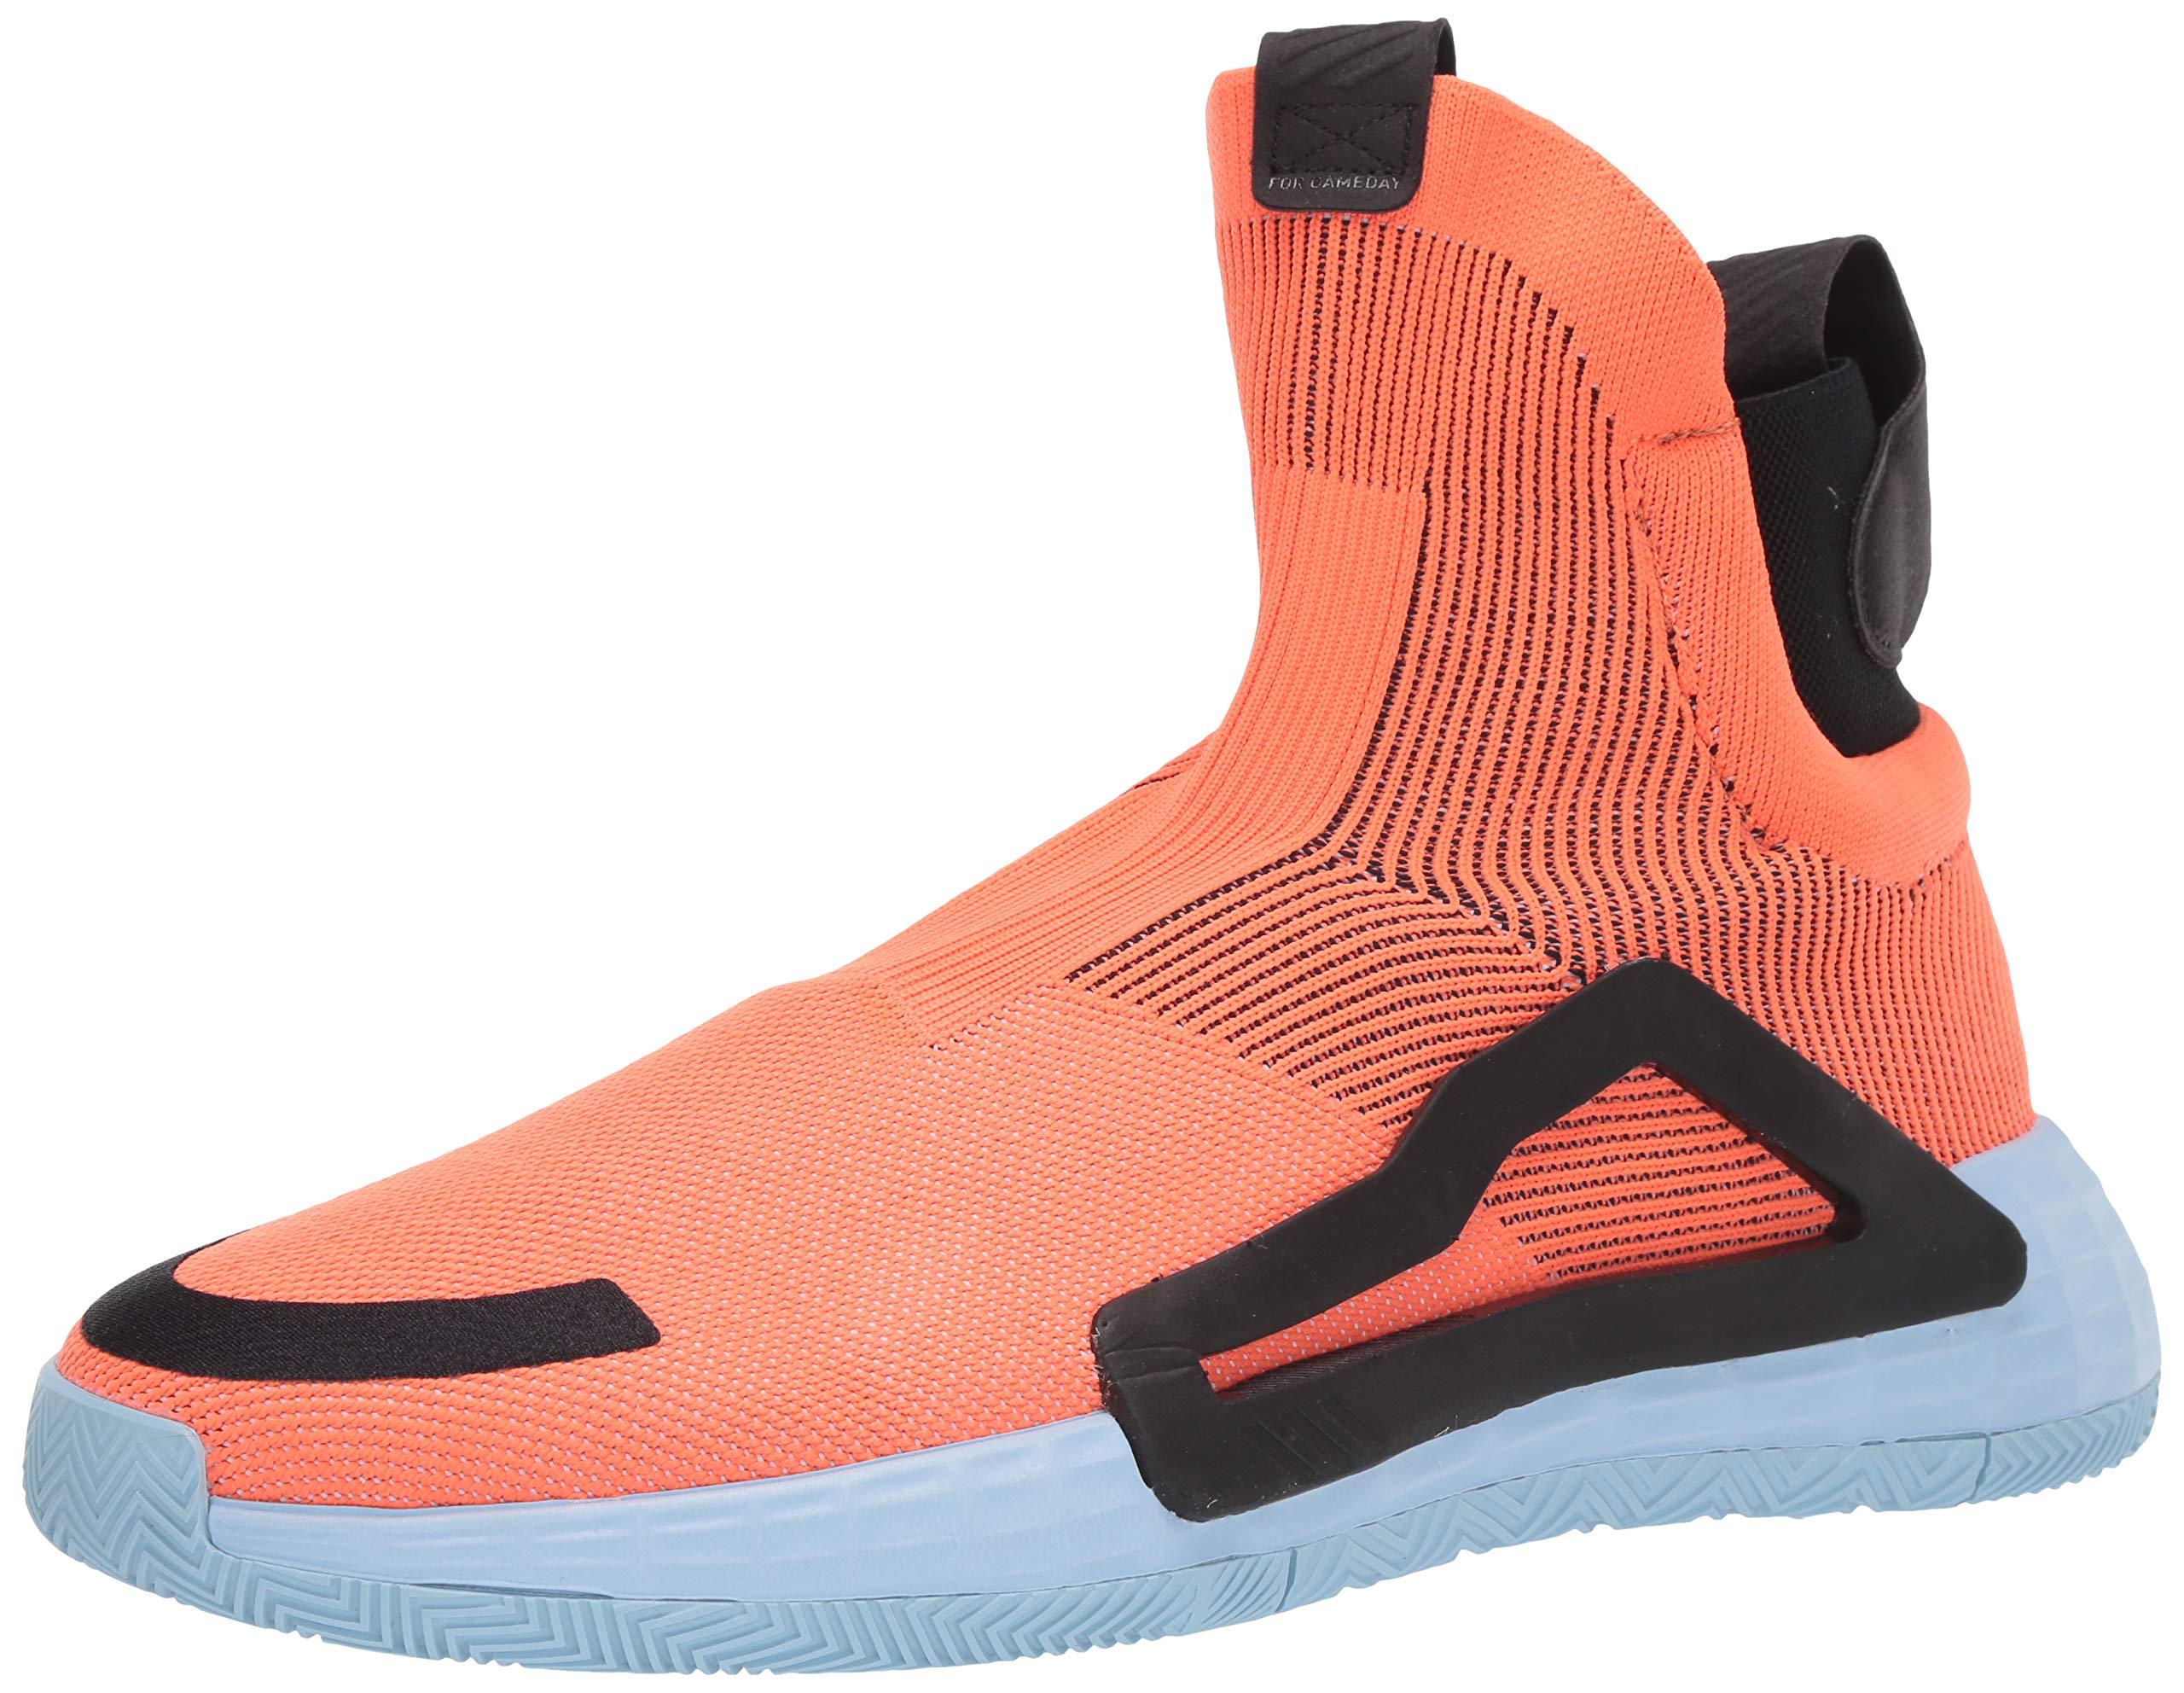 adidas Men's N3Xt L3V3L Basketball Shoe, hi-res Coral/Glow Blue/Black, 15 M US by adidas